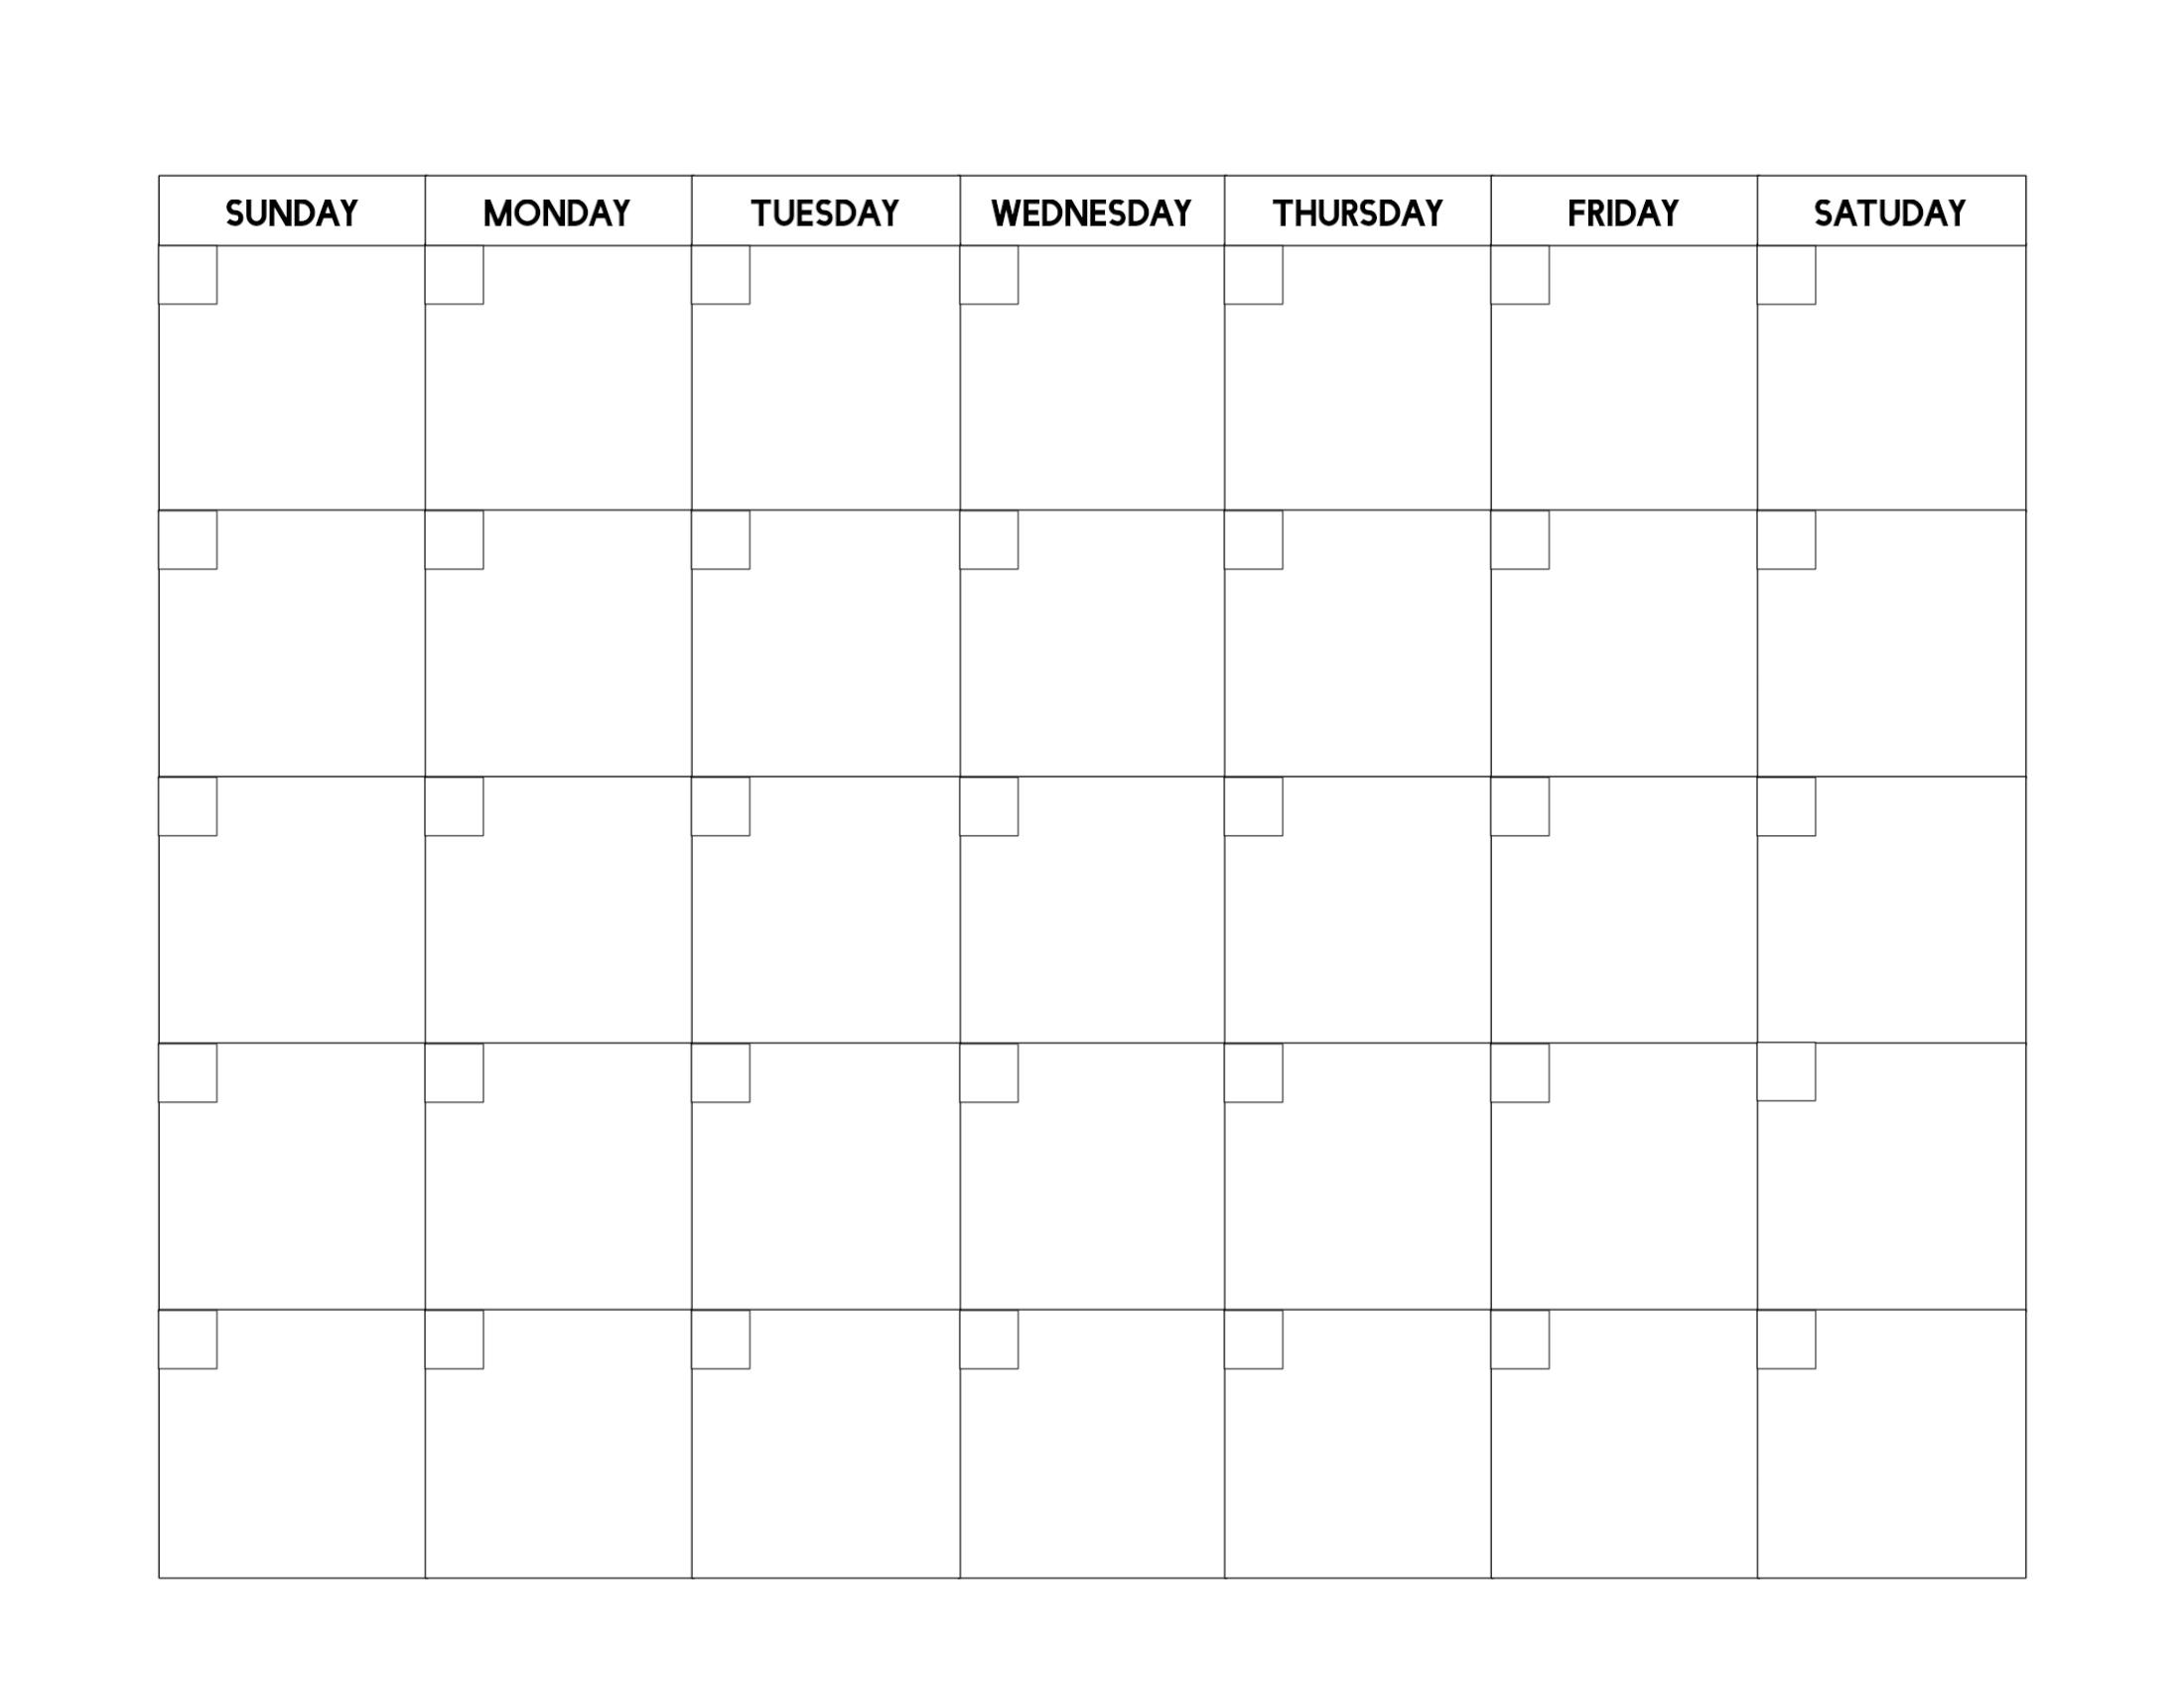 Free Printable Blank Calendar Template - Paper Trail Design Free Printable Calendar Fill In